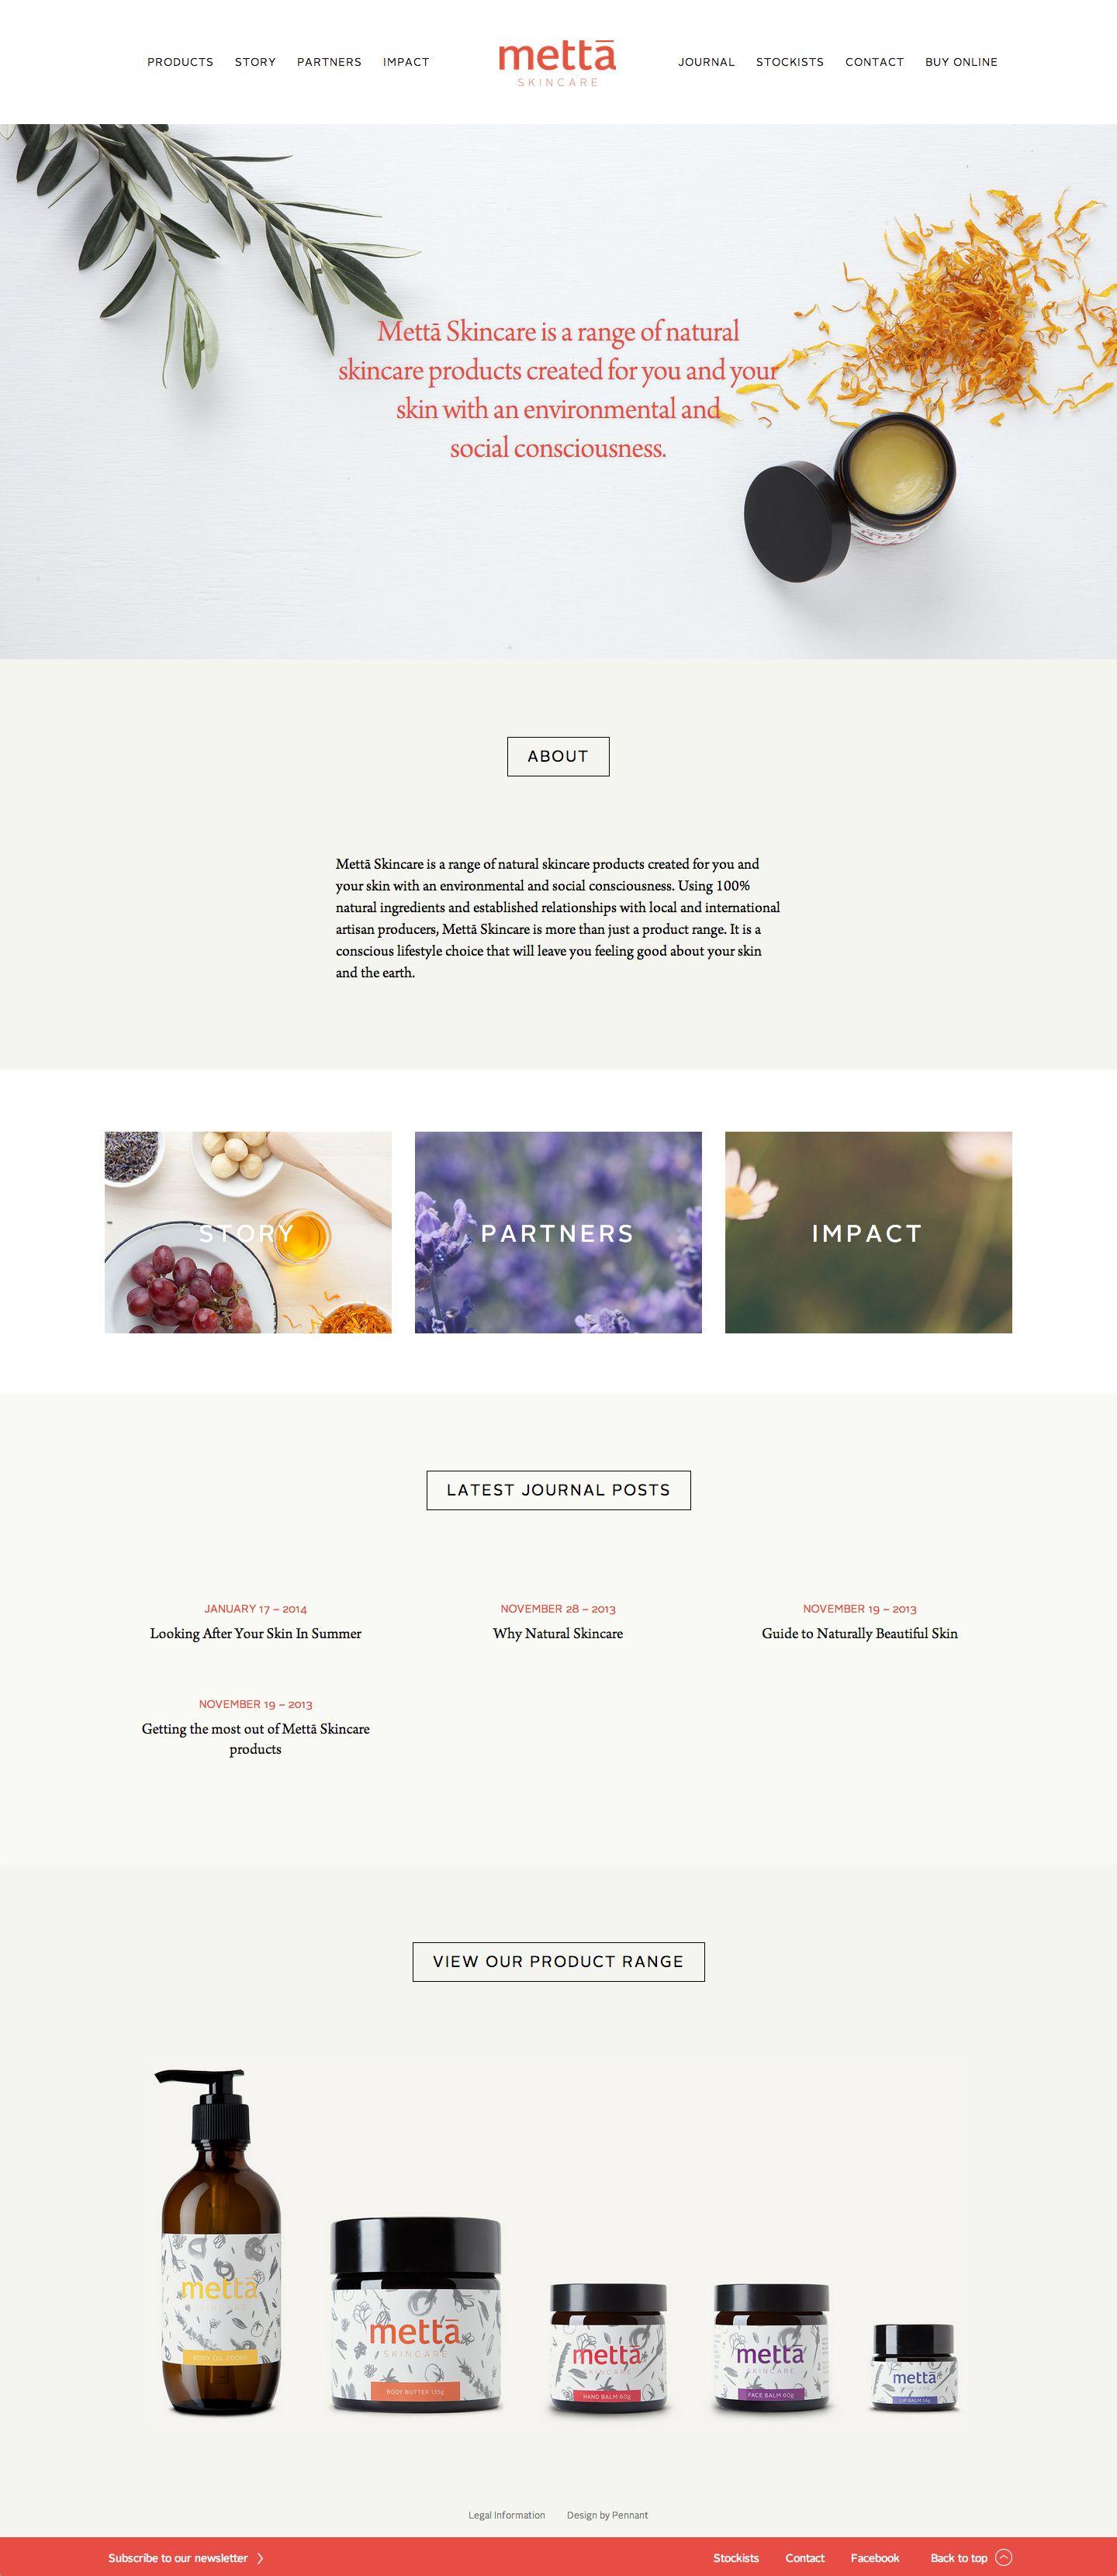 metta-skincare-agency-dominion-pinterest